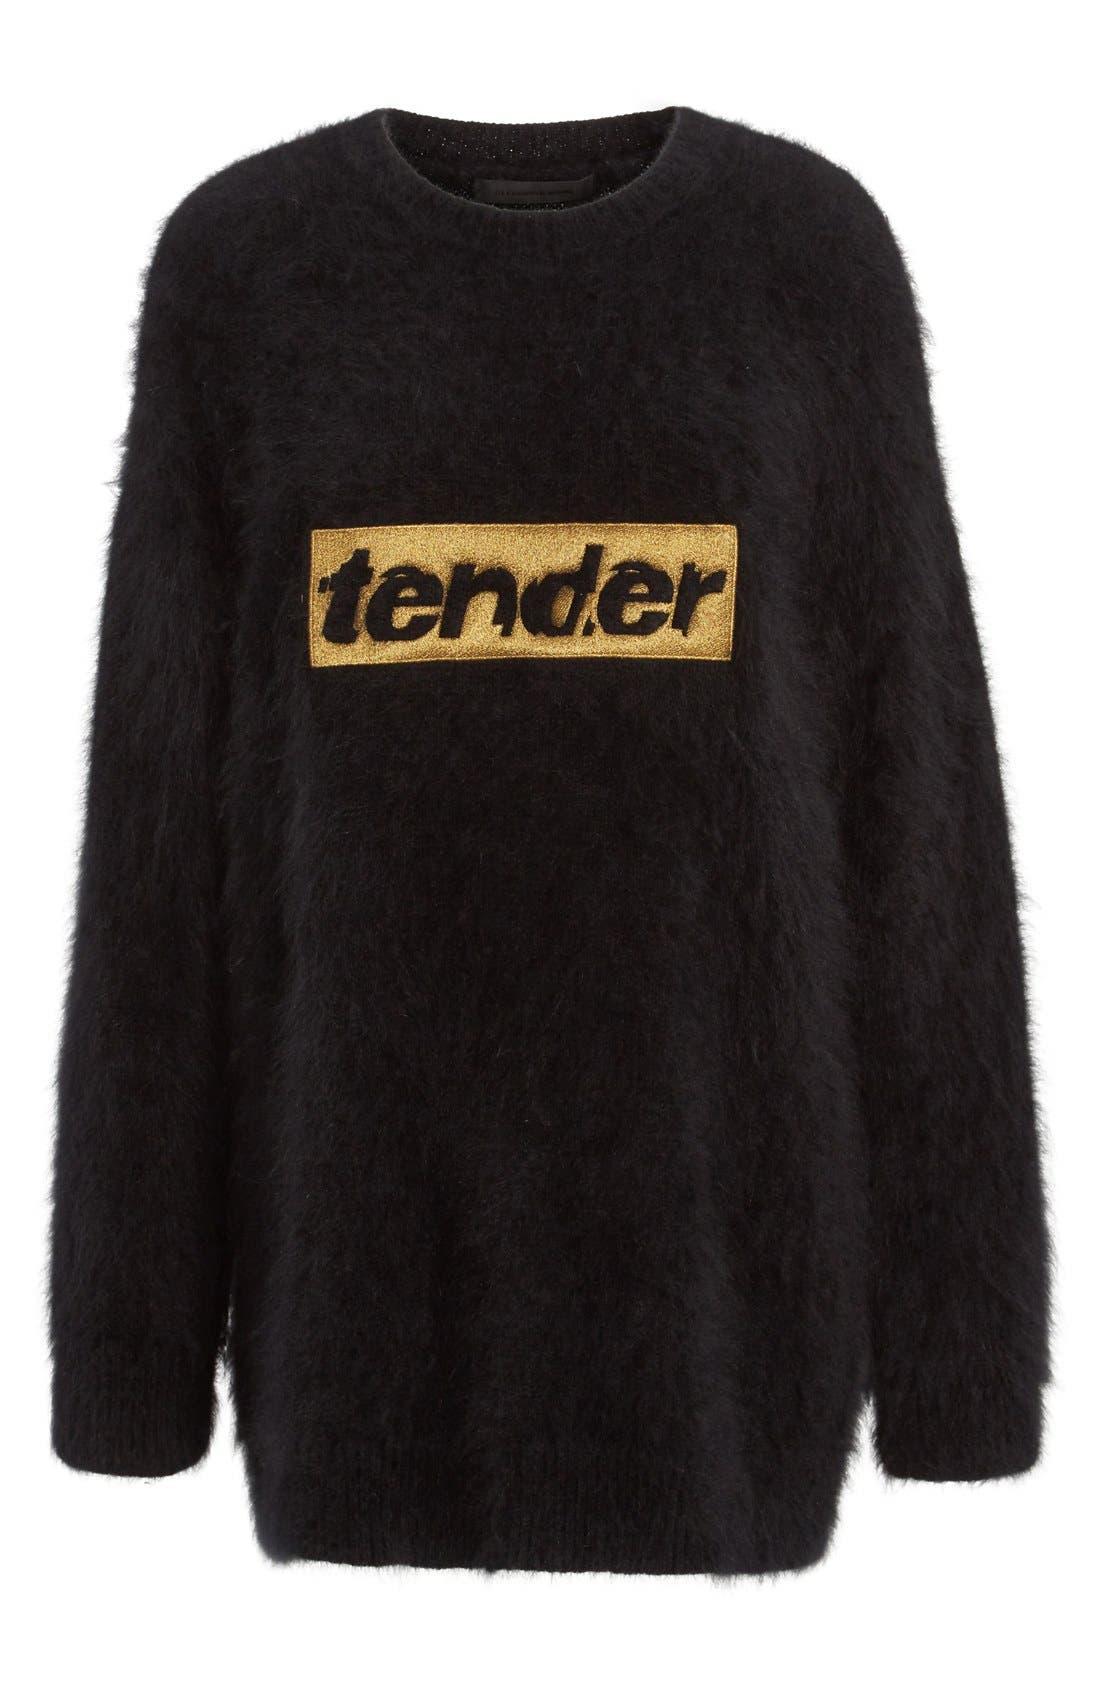 Alternate Image 4  - Alexander Wang 'Tender' Embroidered Wool Blend Sweater